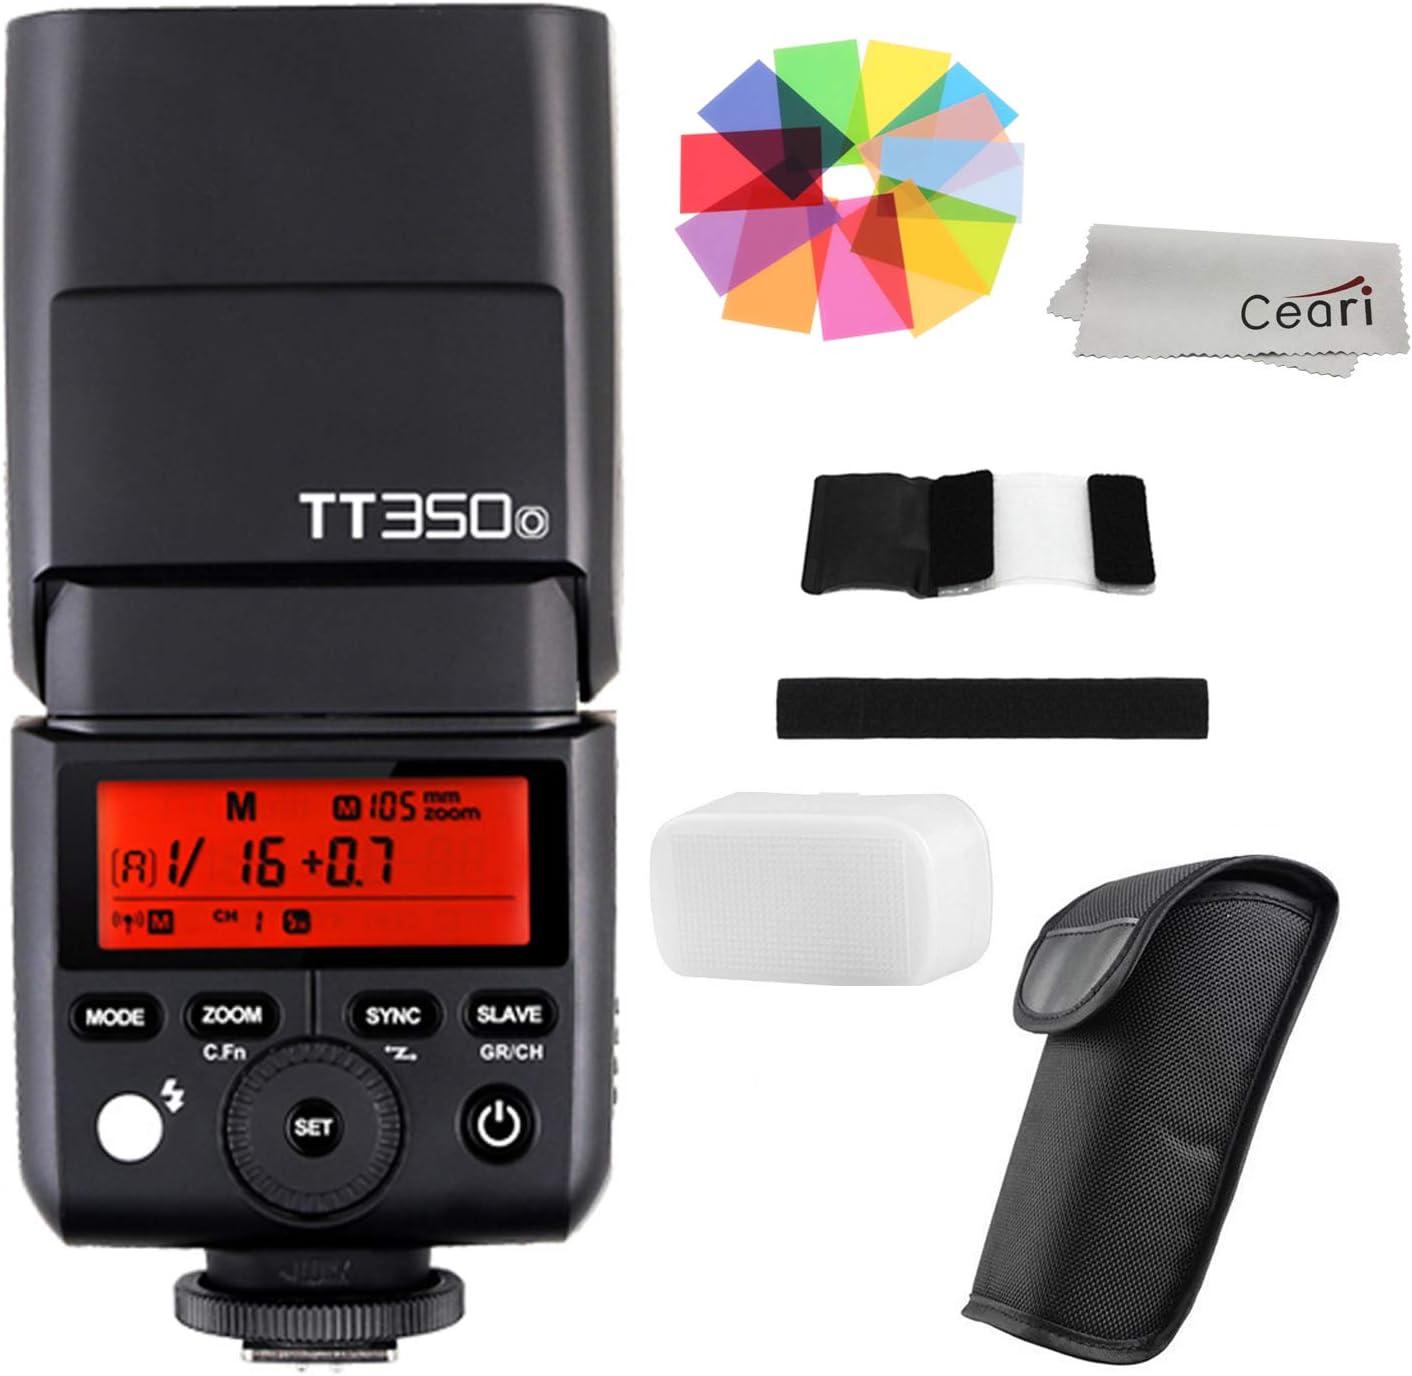 Godox TT350o 2.4G Wireless TTL Flash Speedlite GN36 1/8000s HSS for Olympus E-P5 E-PL5 E-PL6 E-PL7 E-PL8 Pen-F DSLR Camera